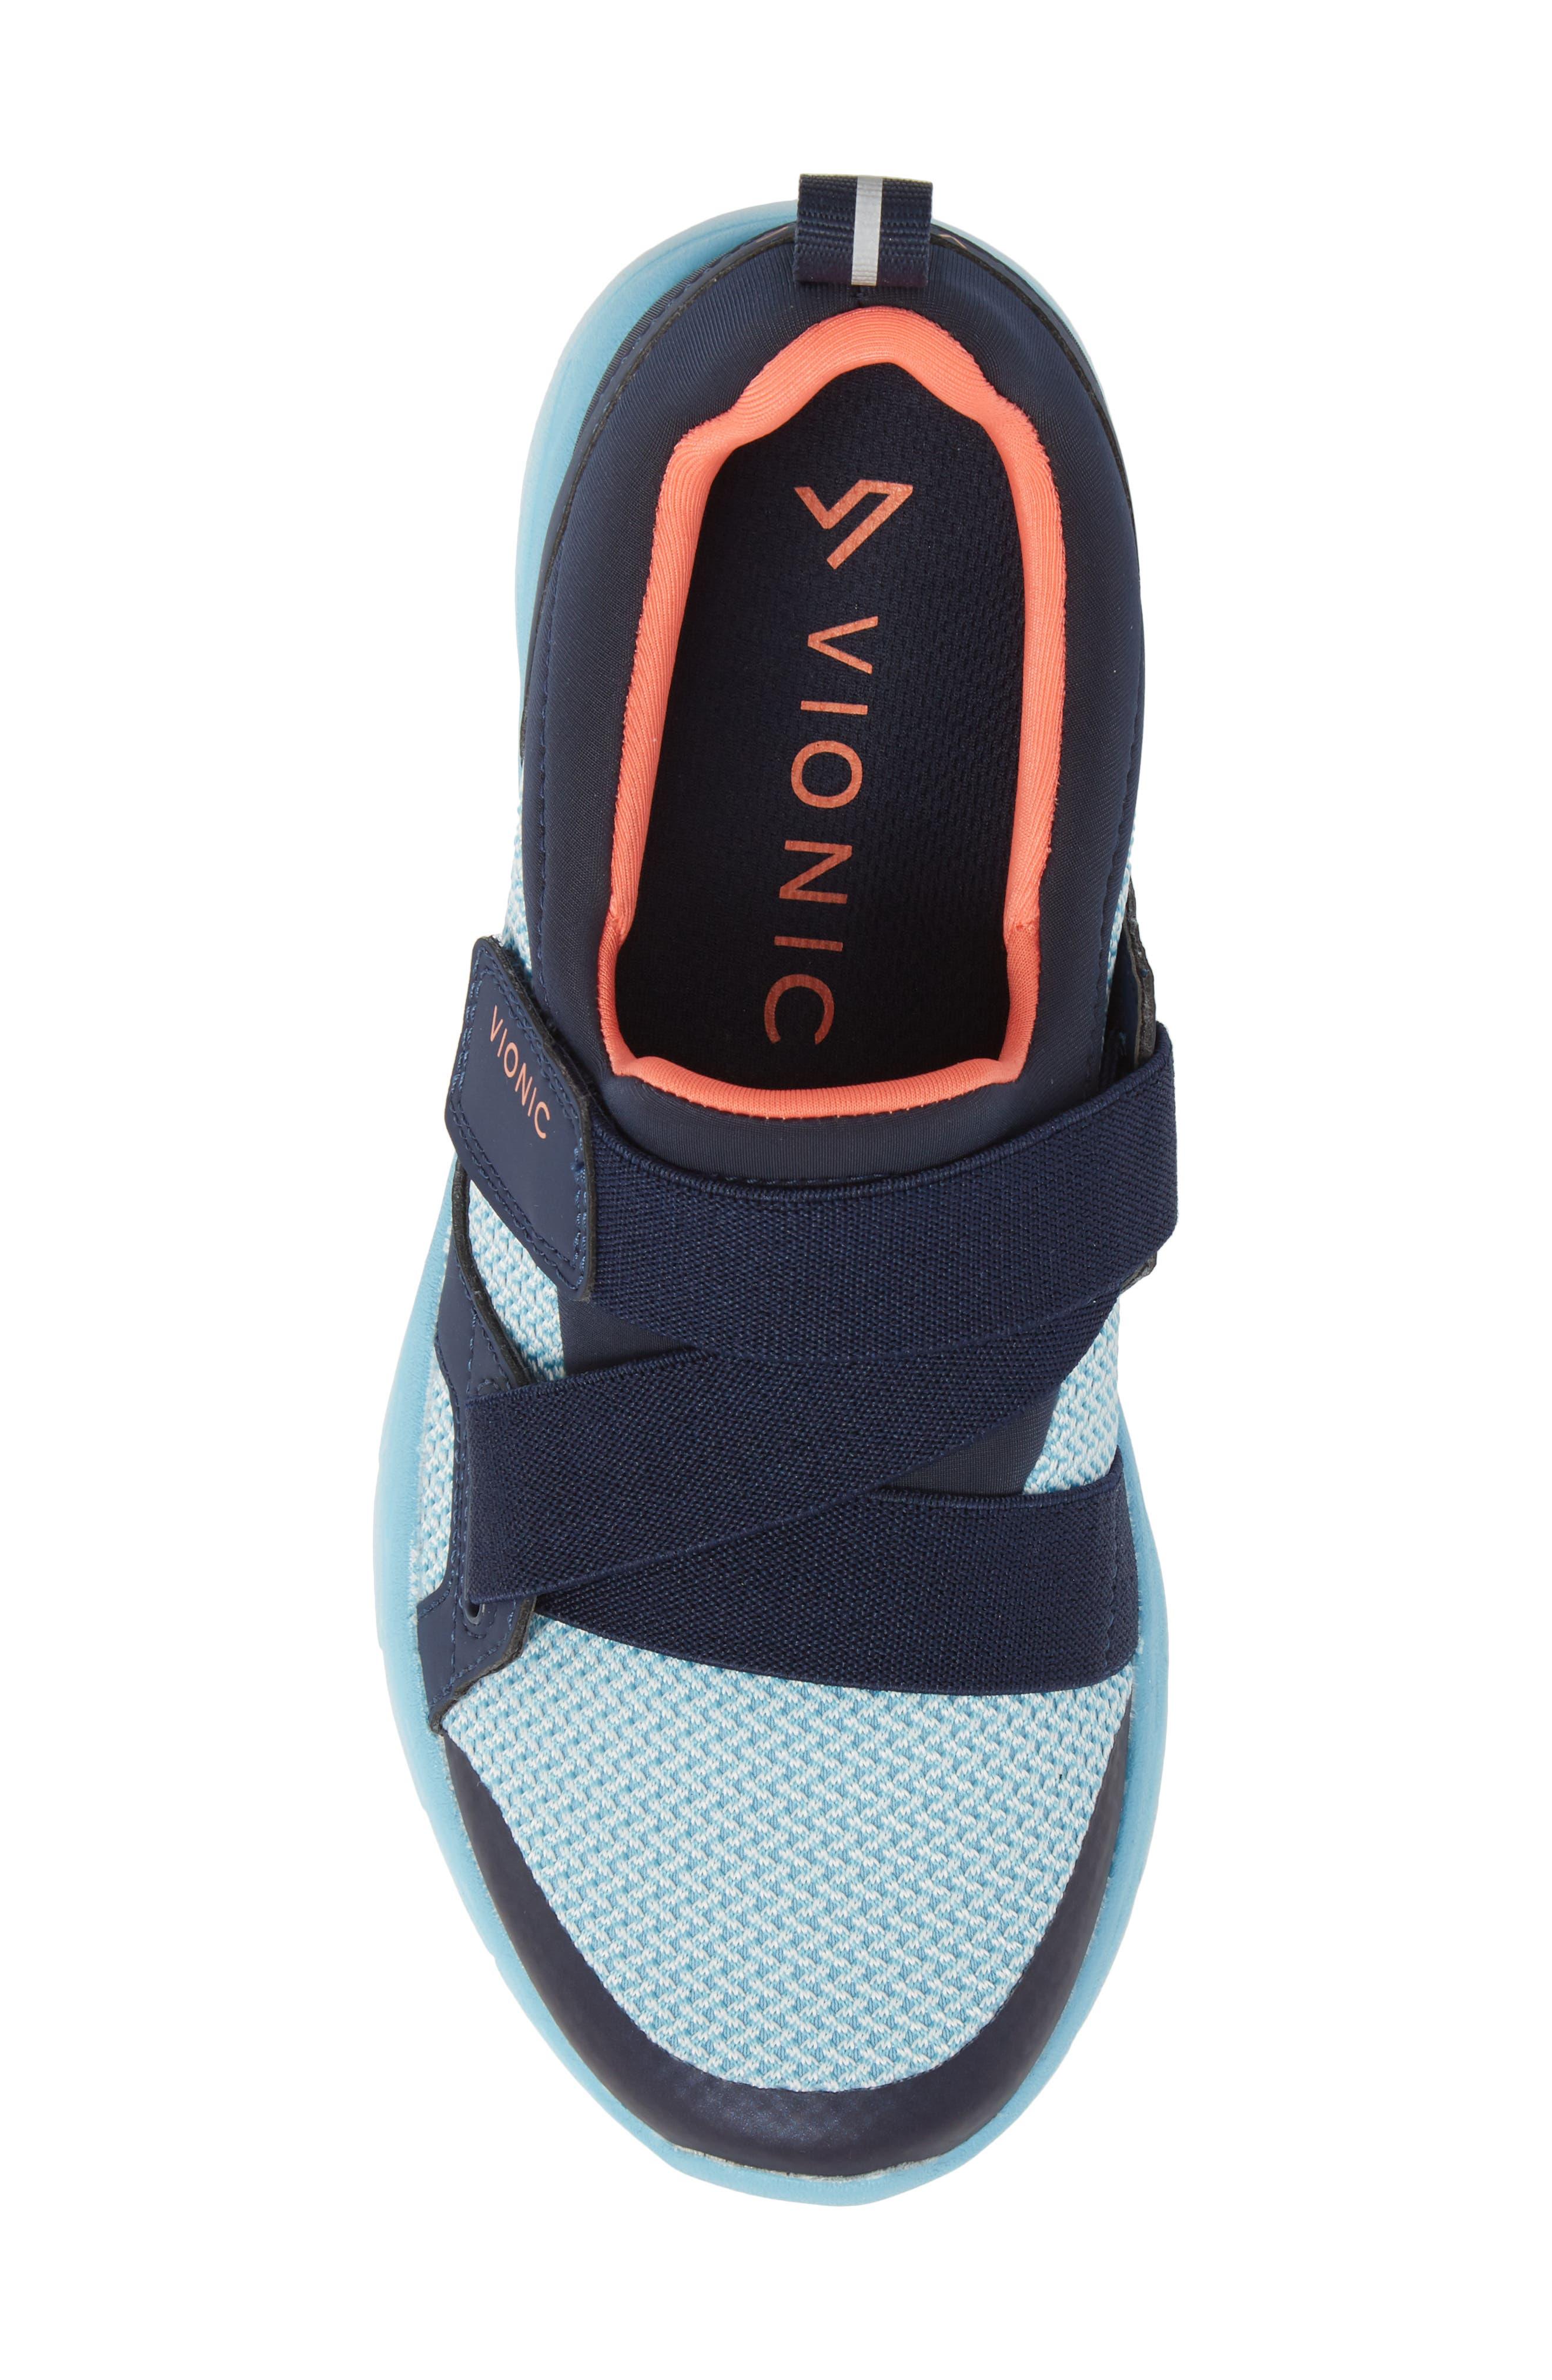 Dash Sneaker,                             Alternate thumbnail 5, color,                             Navy/ Light Blue Fabric